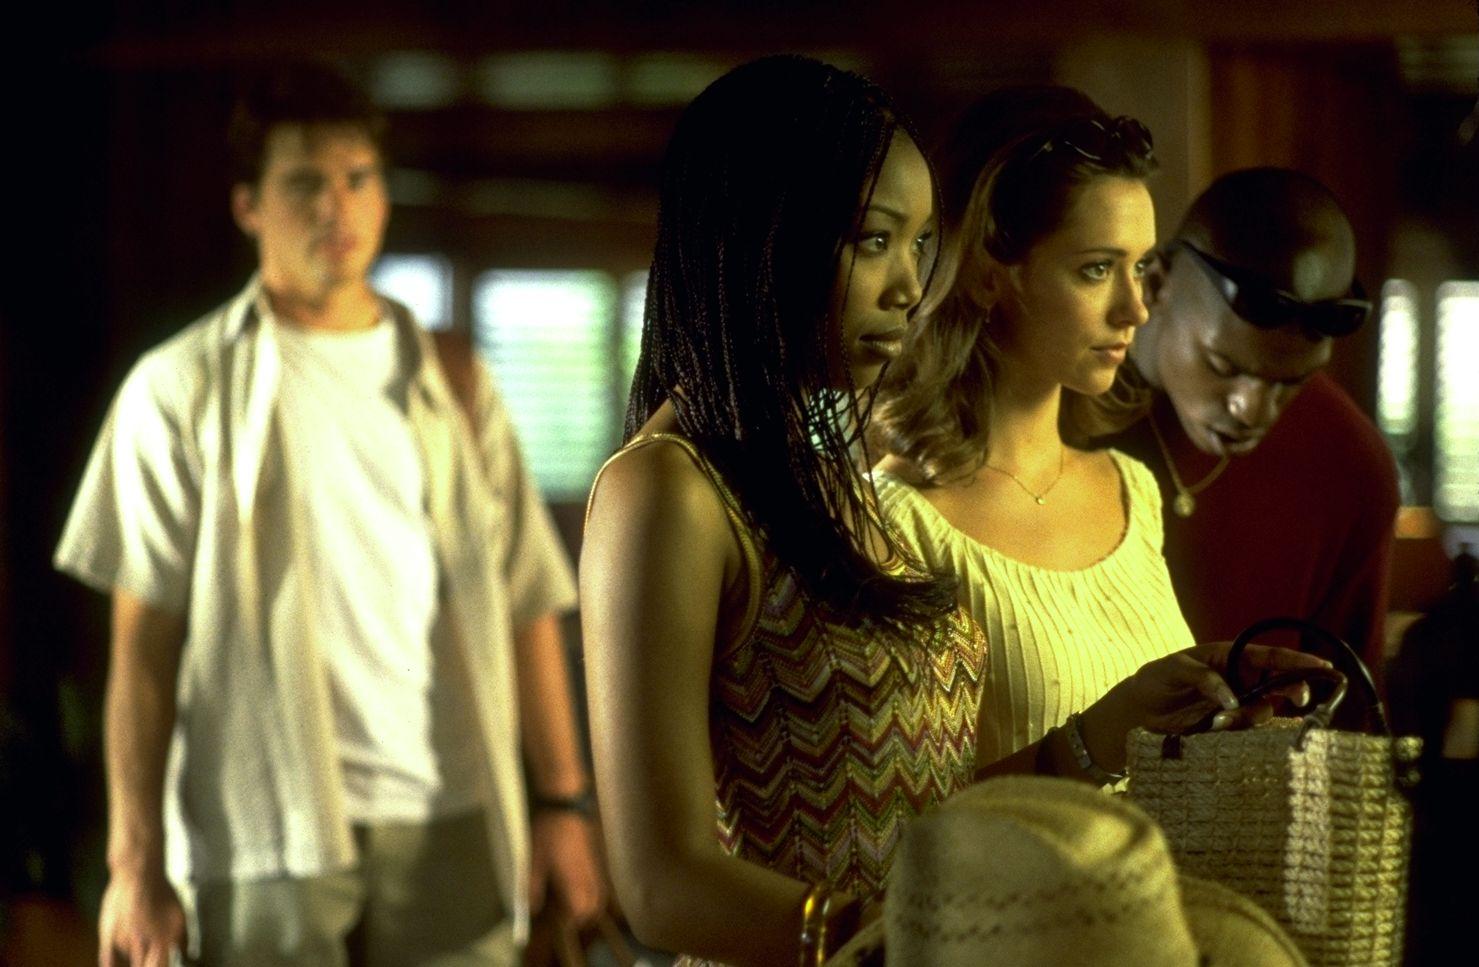 Matthew Settle, Brandy, Jennifer Love Hewitt and Mekhi Phifer in I Still Know What You Did Last Summer (1998)